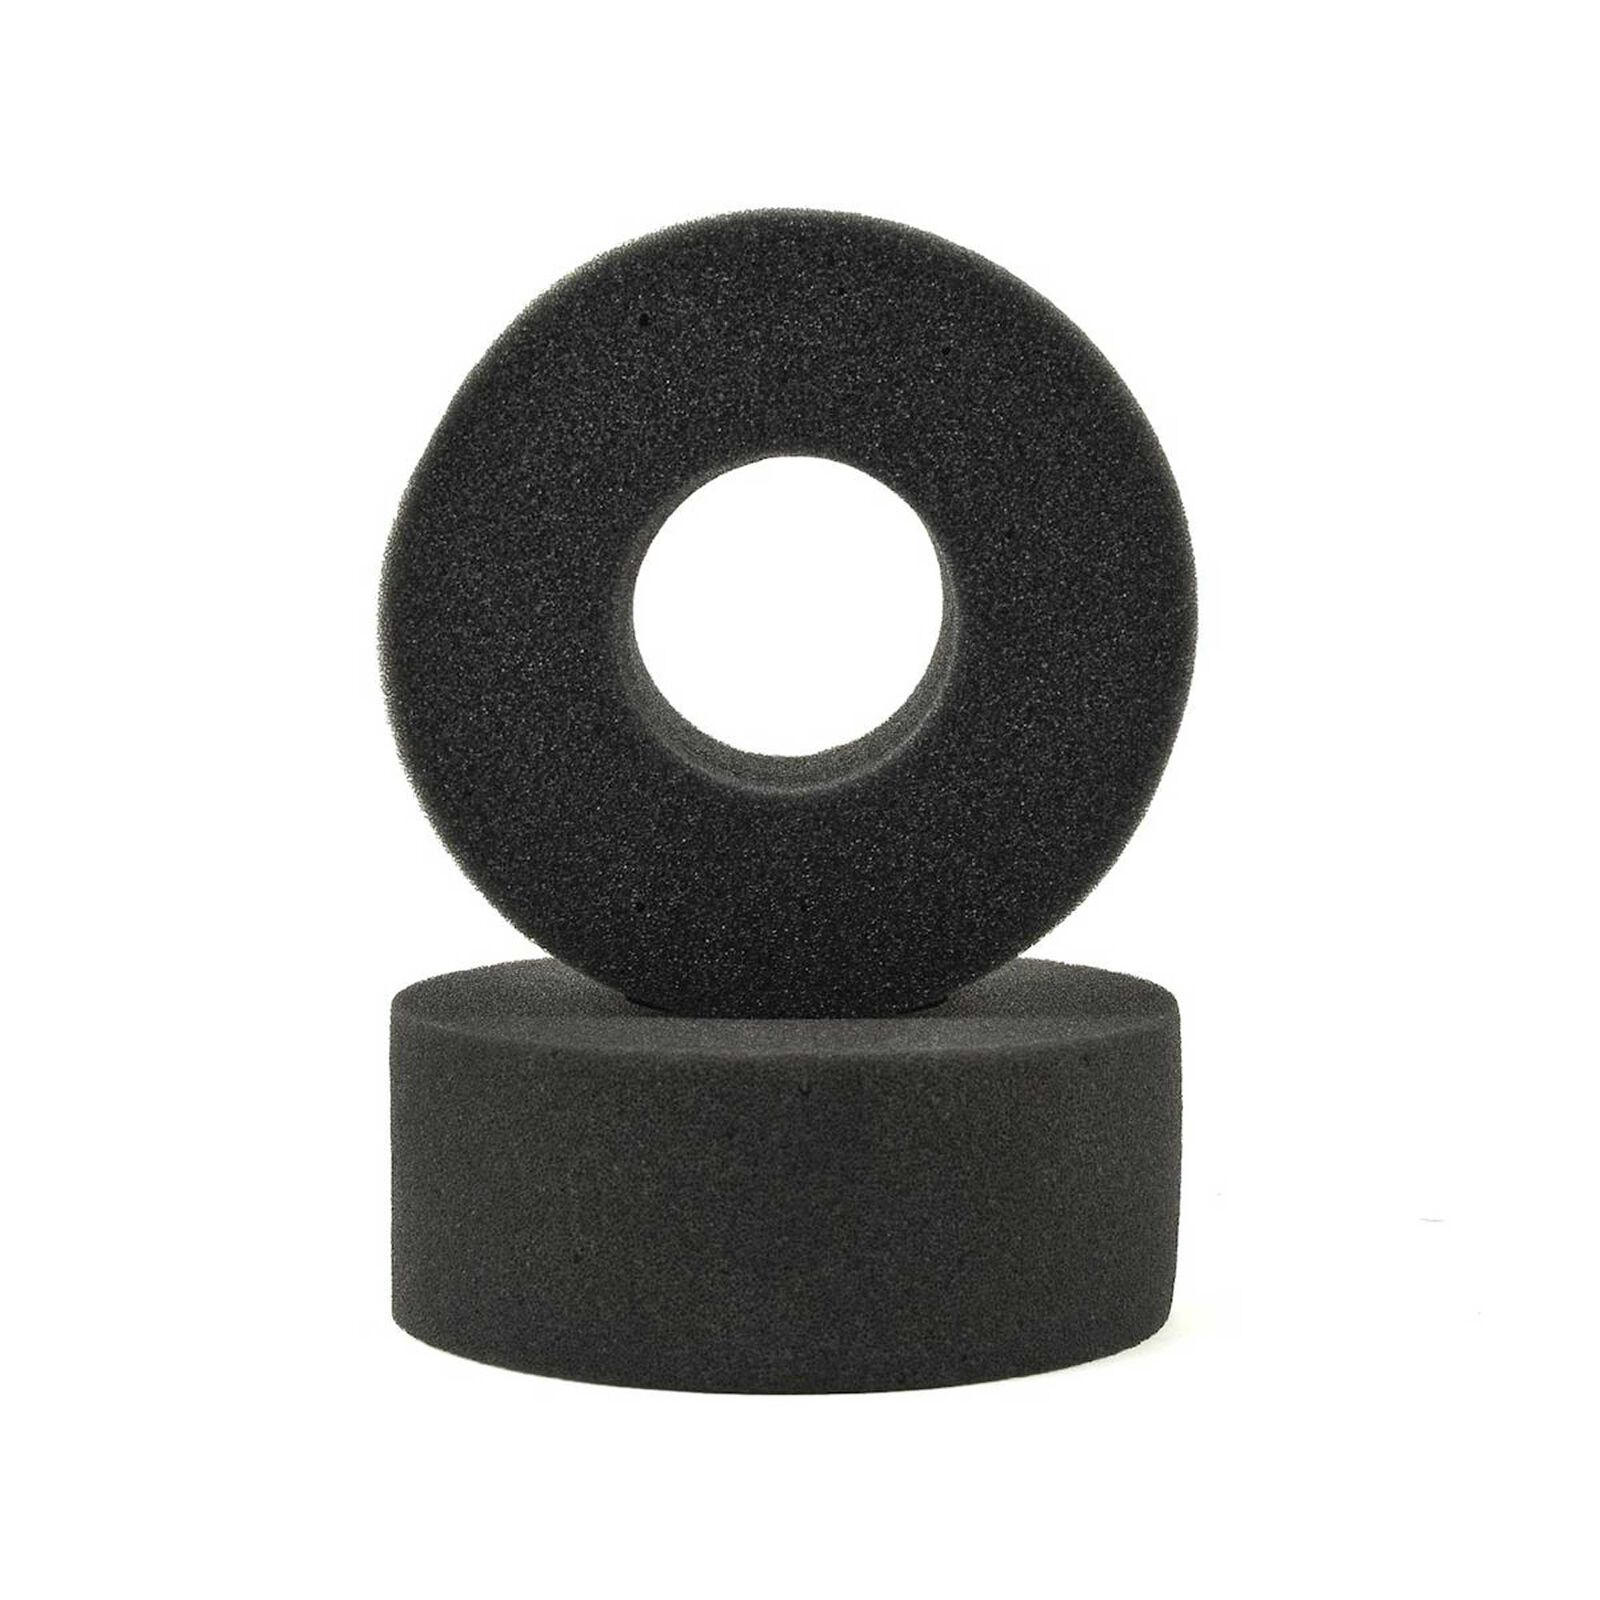 Dirty Richard Single Stage Foam Inserts  Soft 104.5x47.6x32 (2)